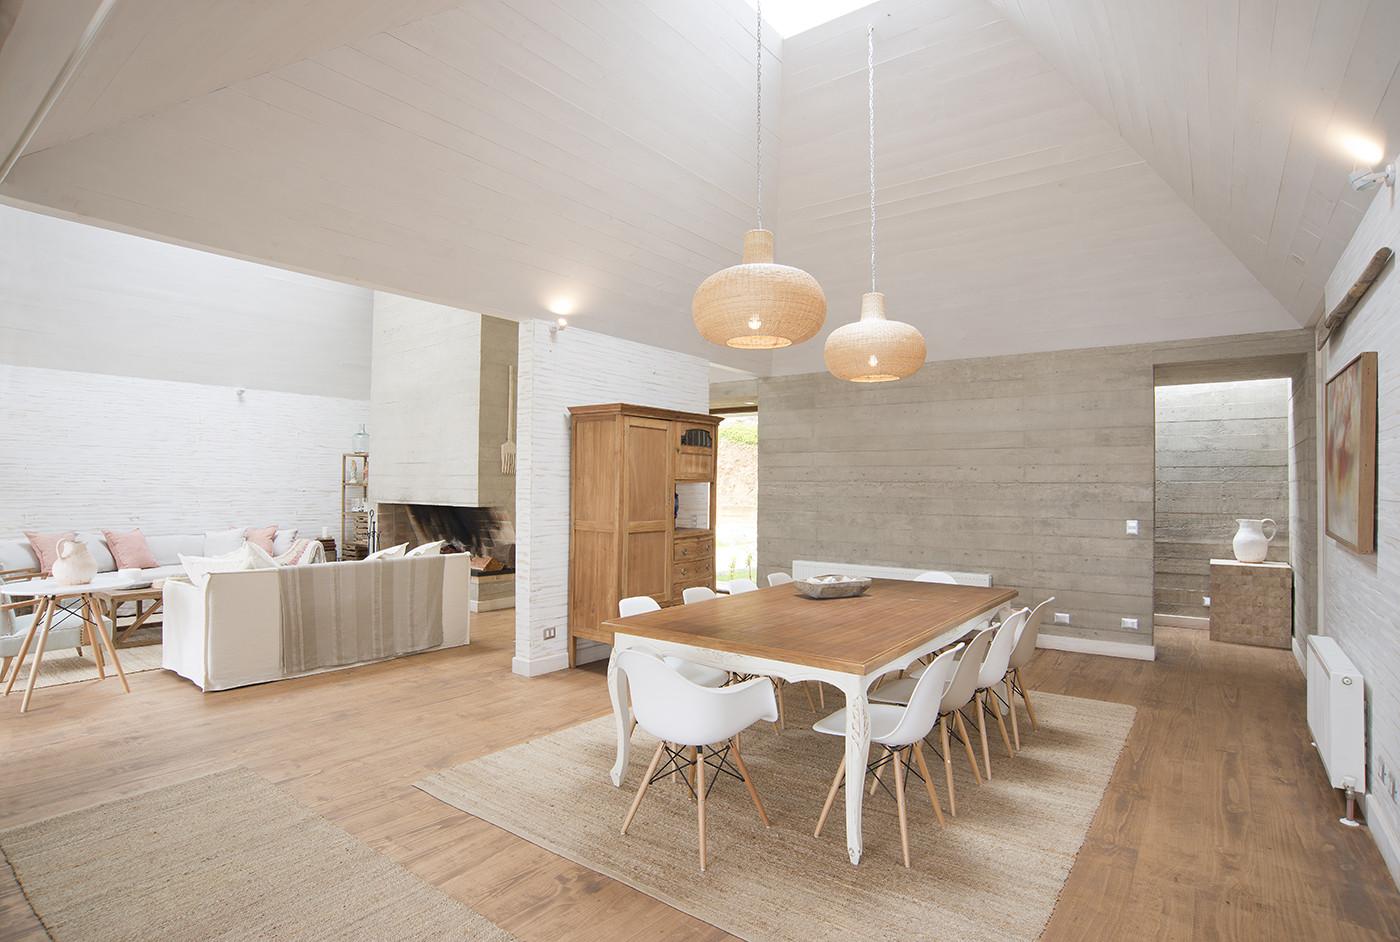 Casa RP / CMA Arquitectos, © Sebastian Aedo / Estudio Apulso